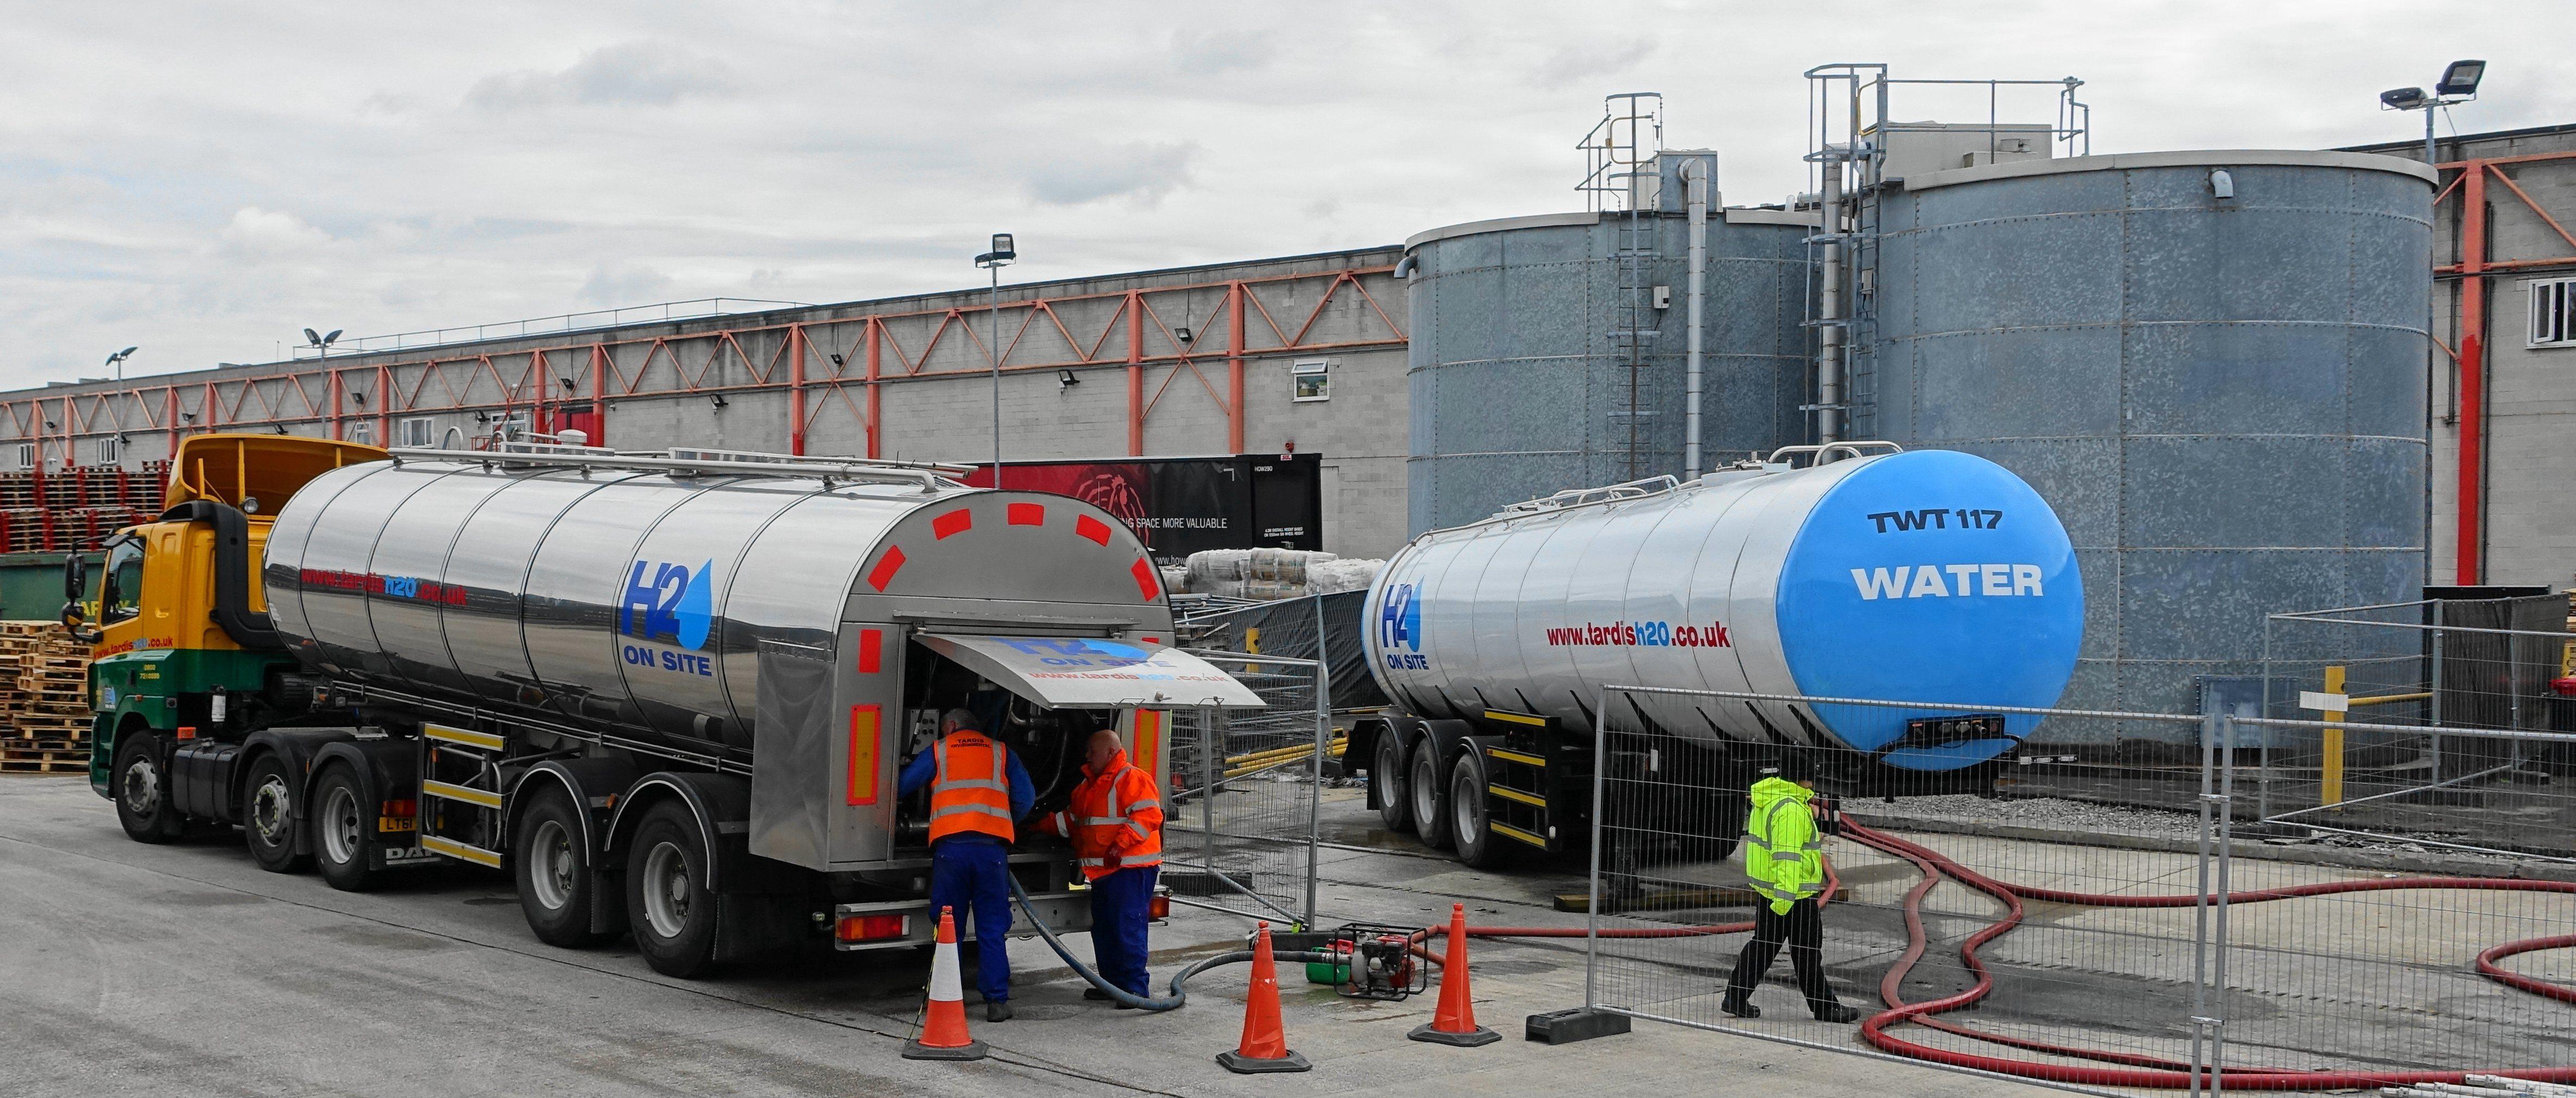 Tardis tanker, tanks